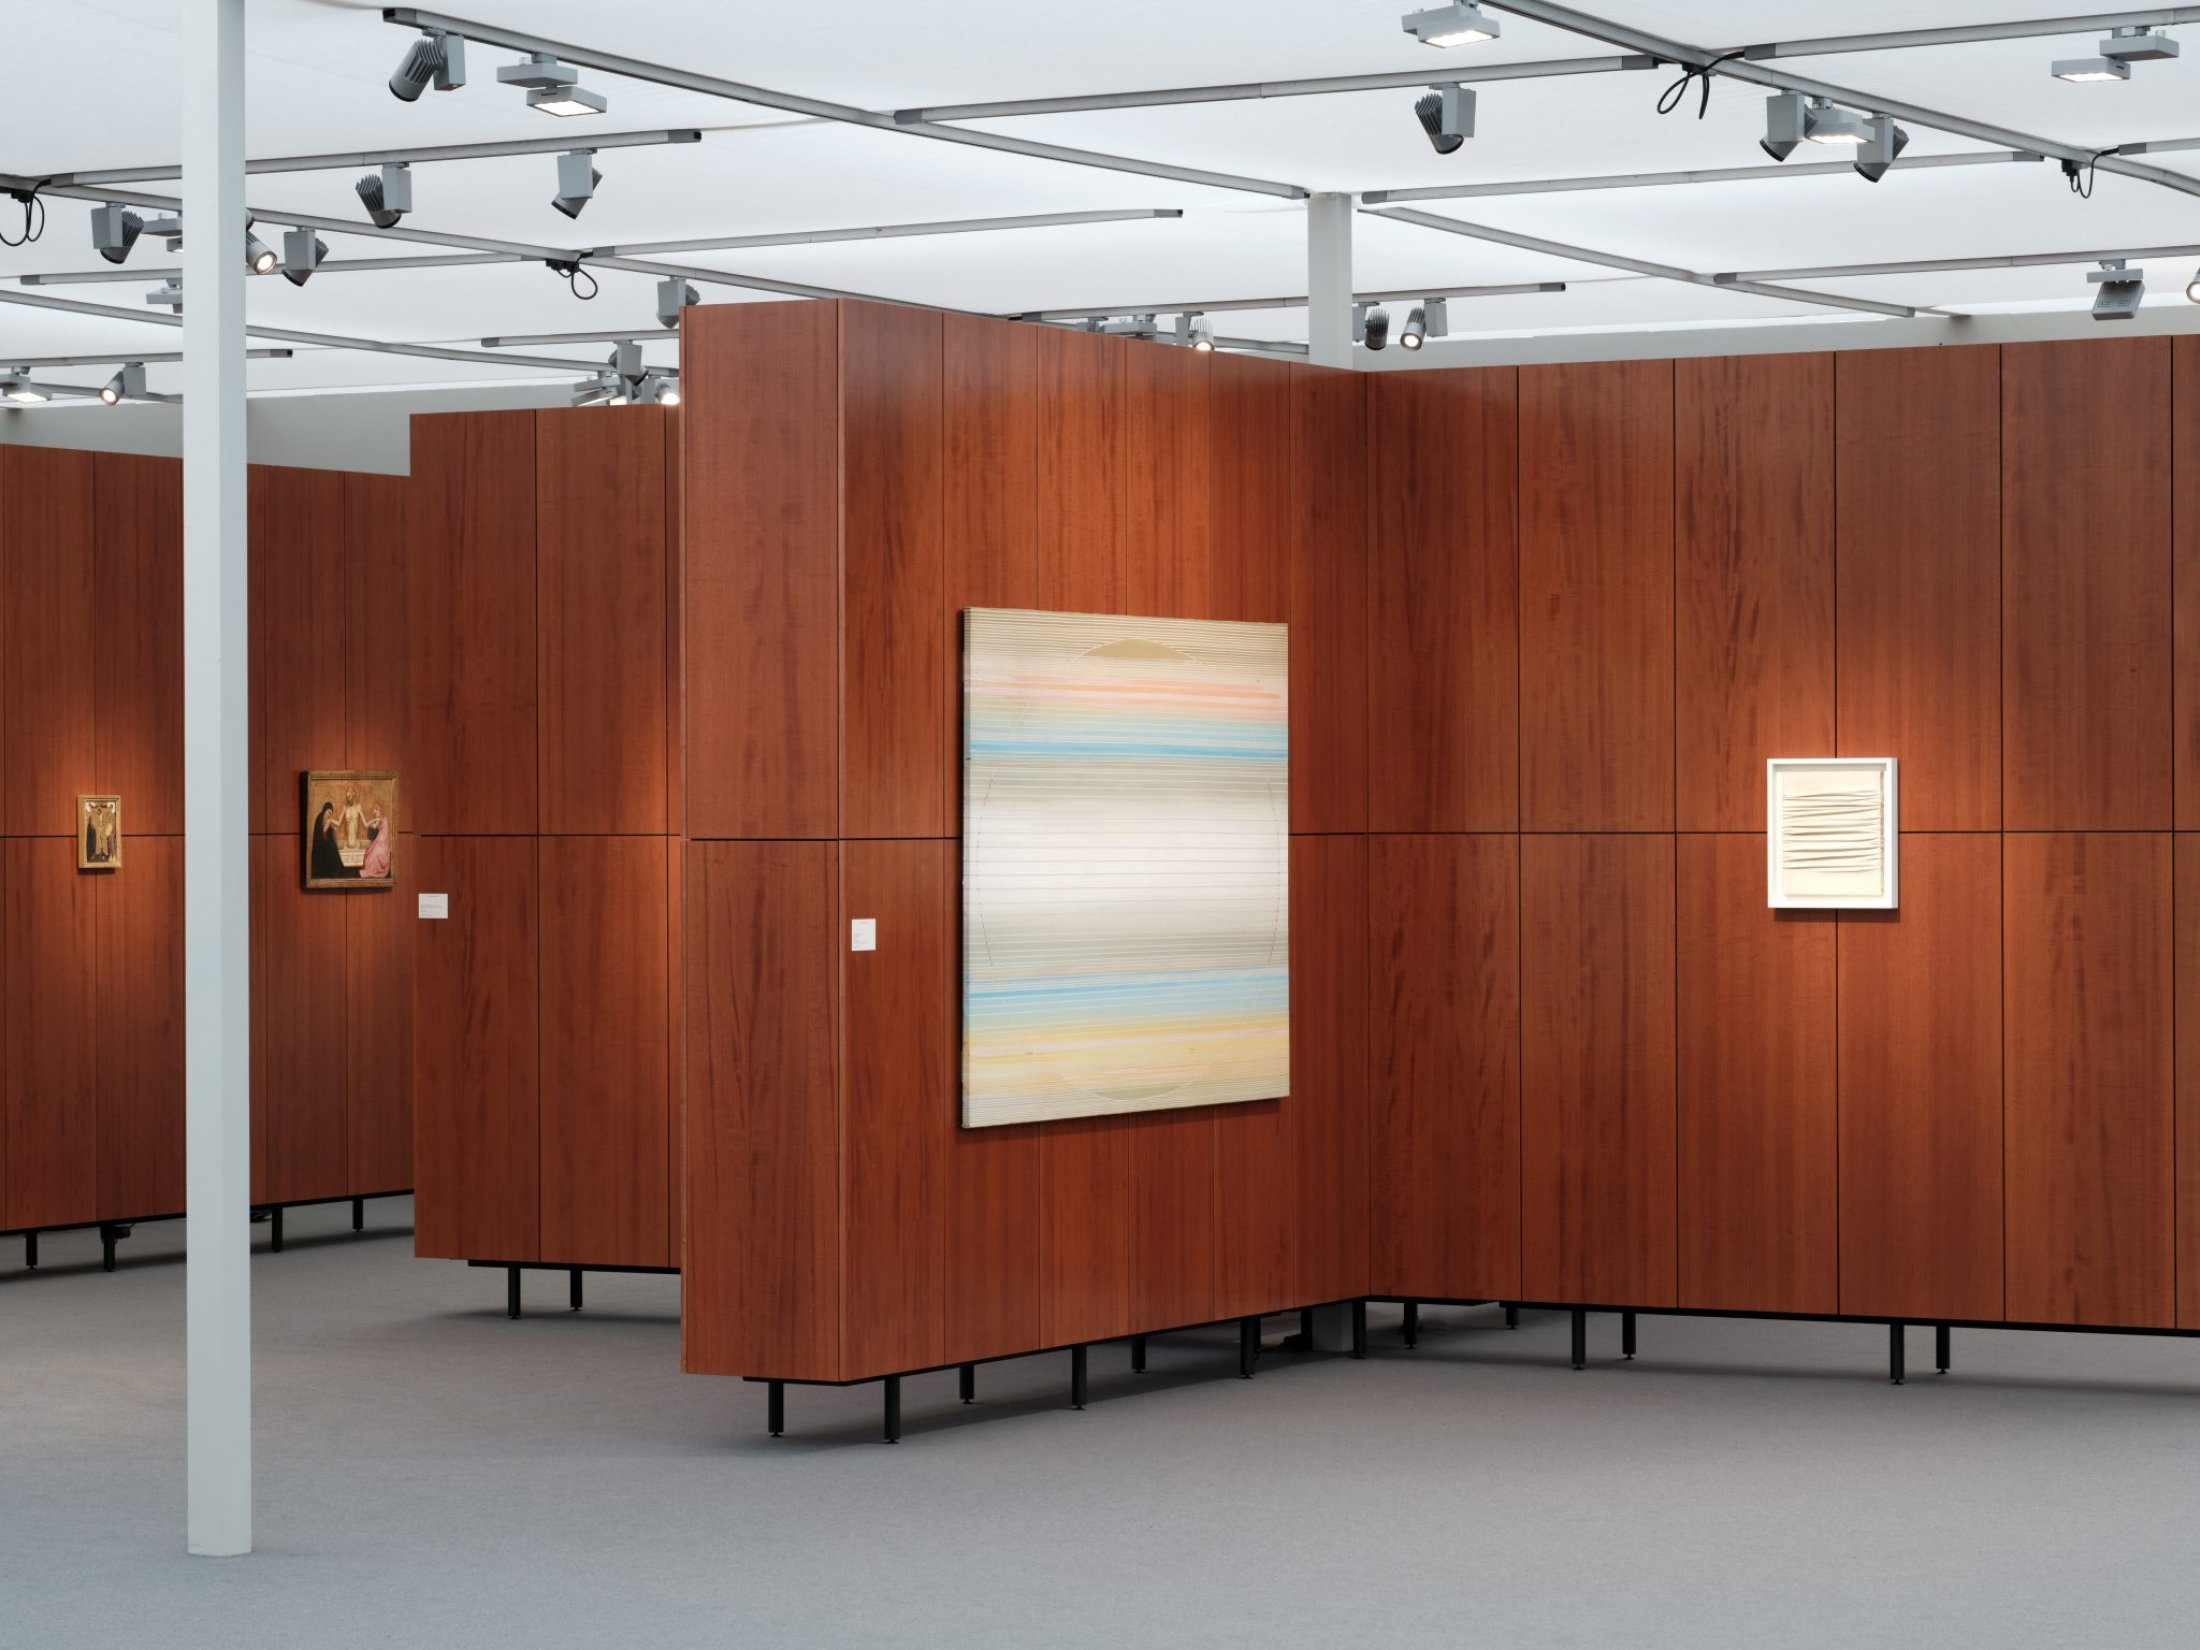 Thomas Adank - Hauser & Wirth at Frieze London